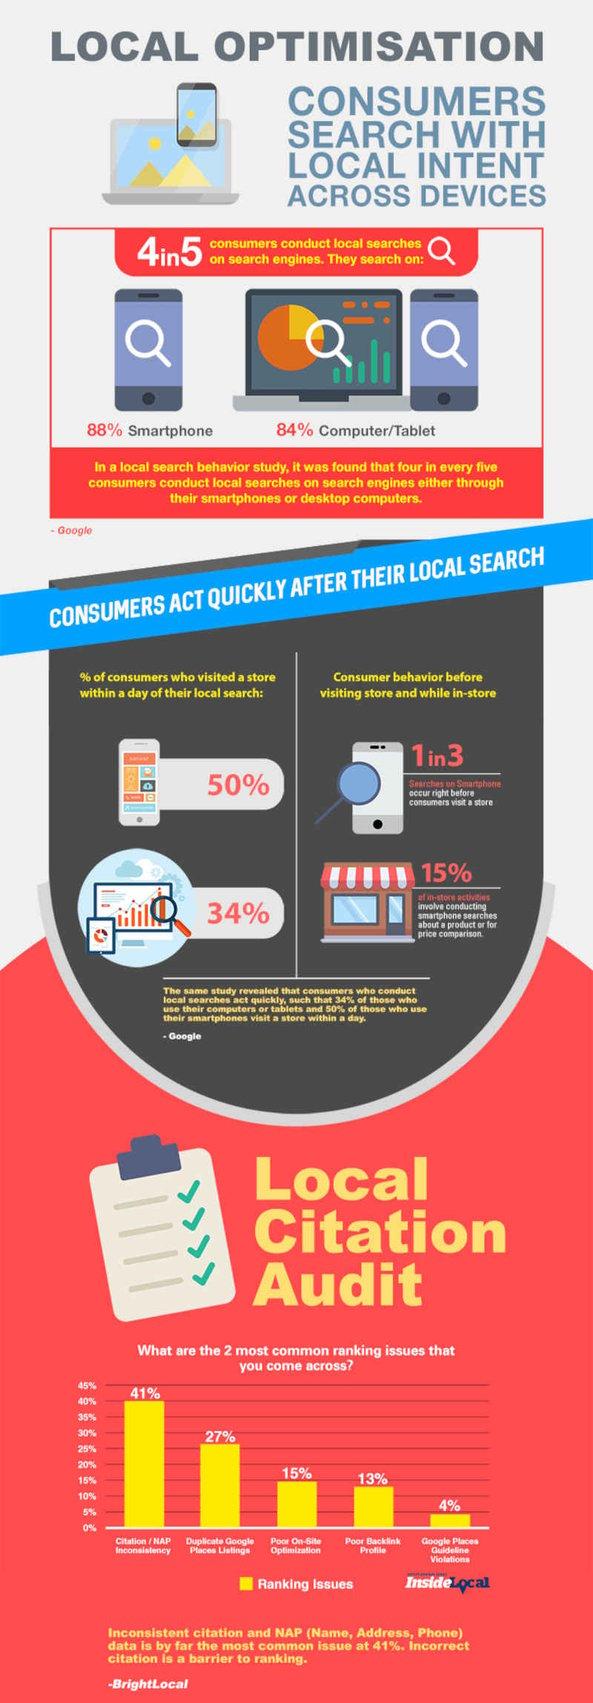 Local Marketing Optimisation - SEO Components 2017